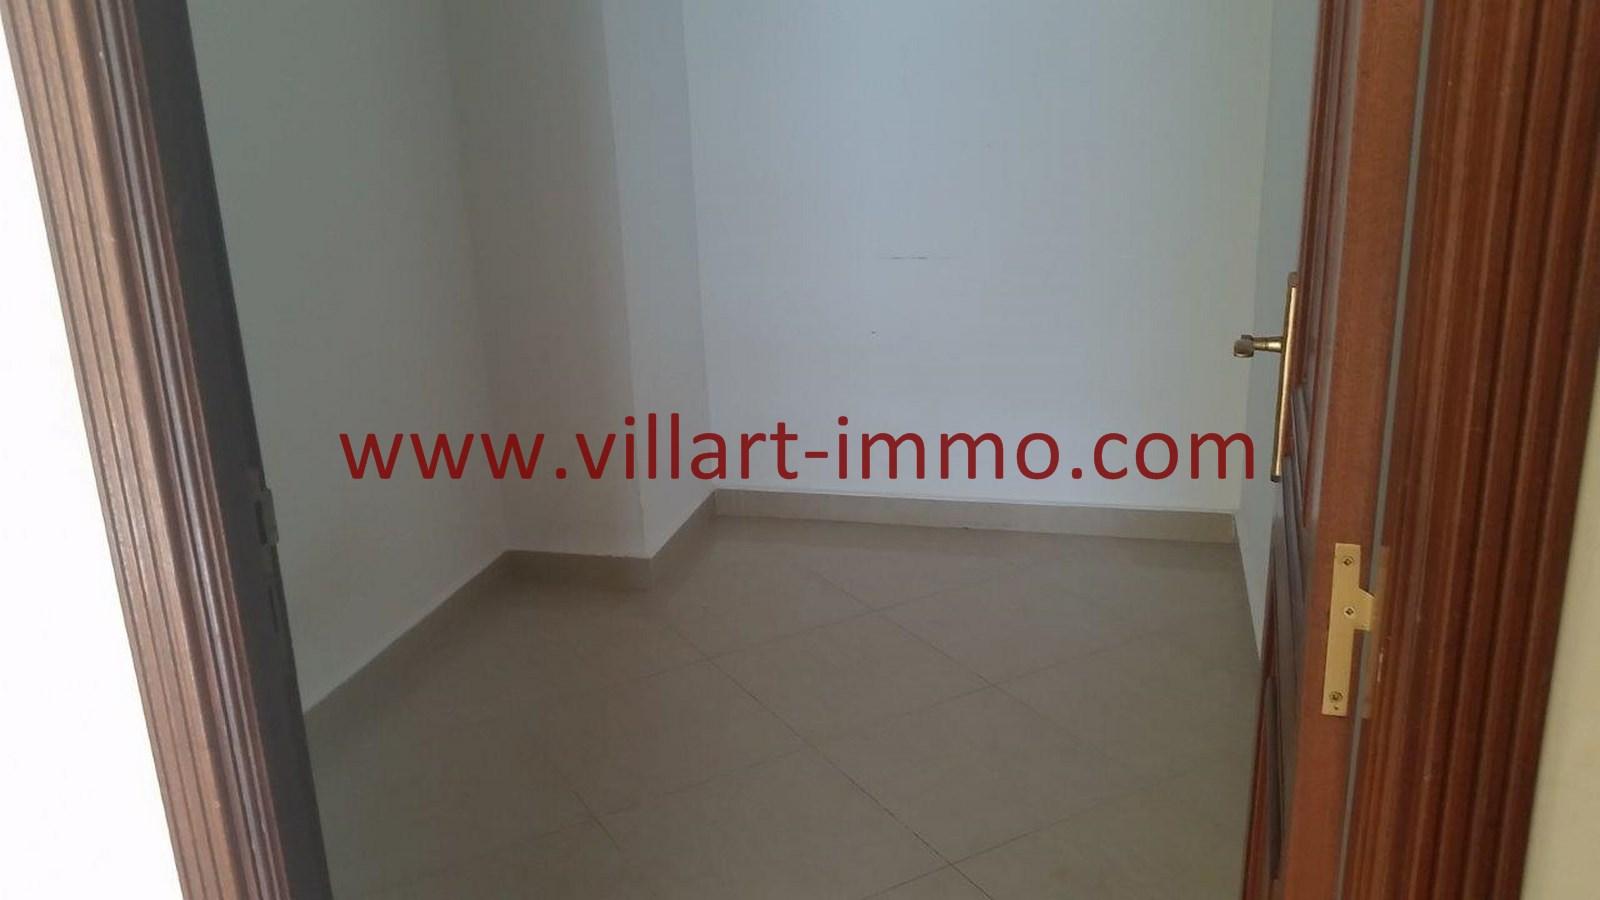 7-a-louer-appartement-tanger-iberia-chambre-1-l907-villart-immo